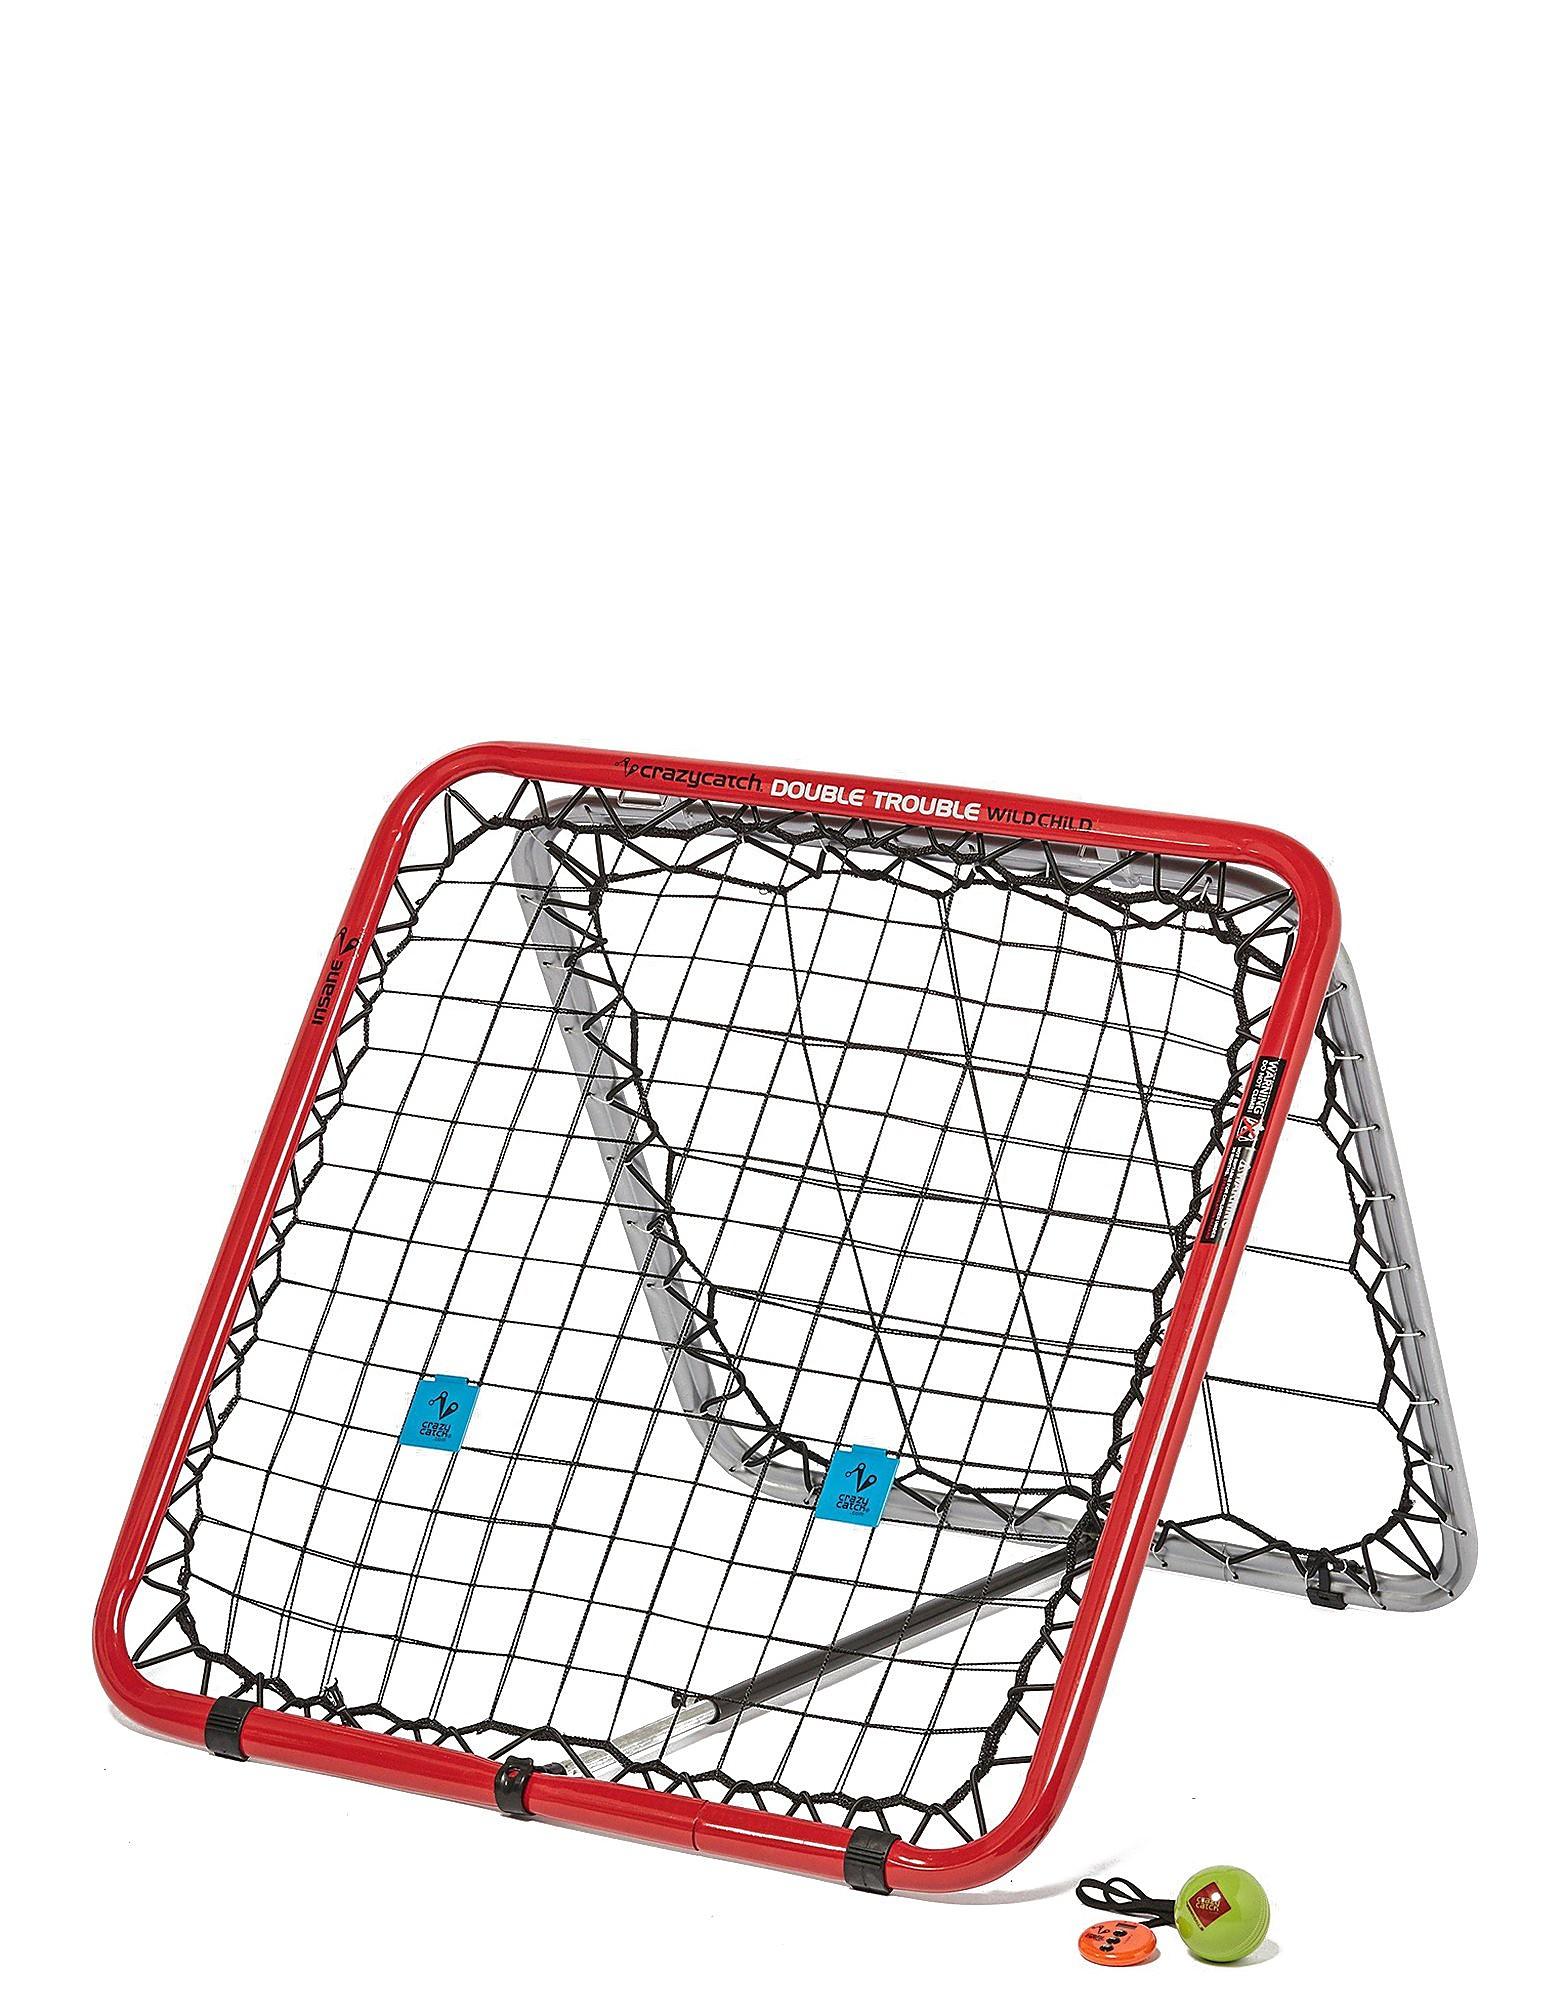 Crazy Catch Crazy Catch Double Trouble Portable Rebound Net